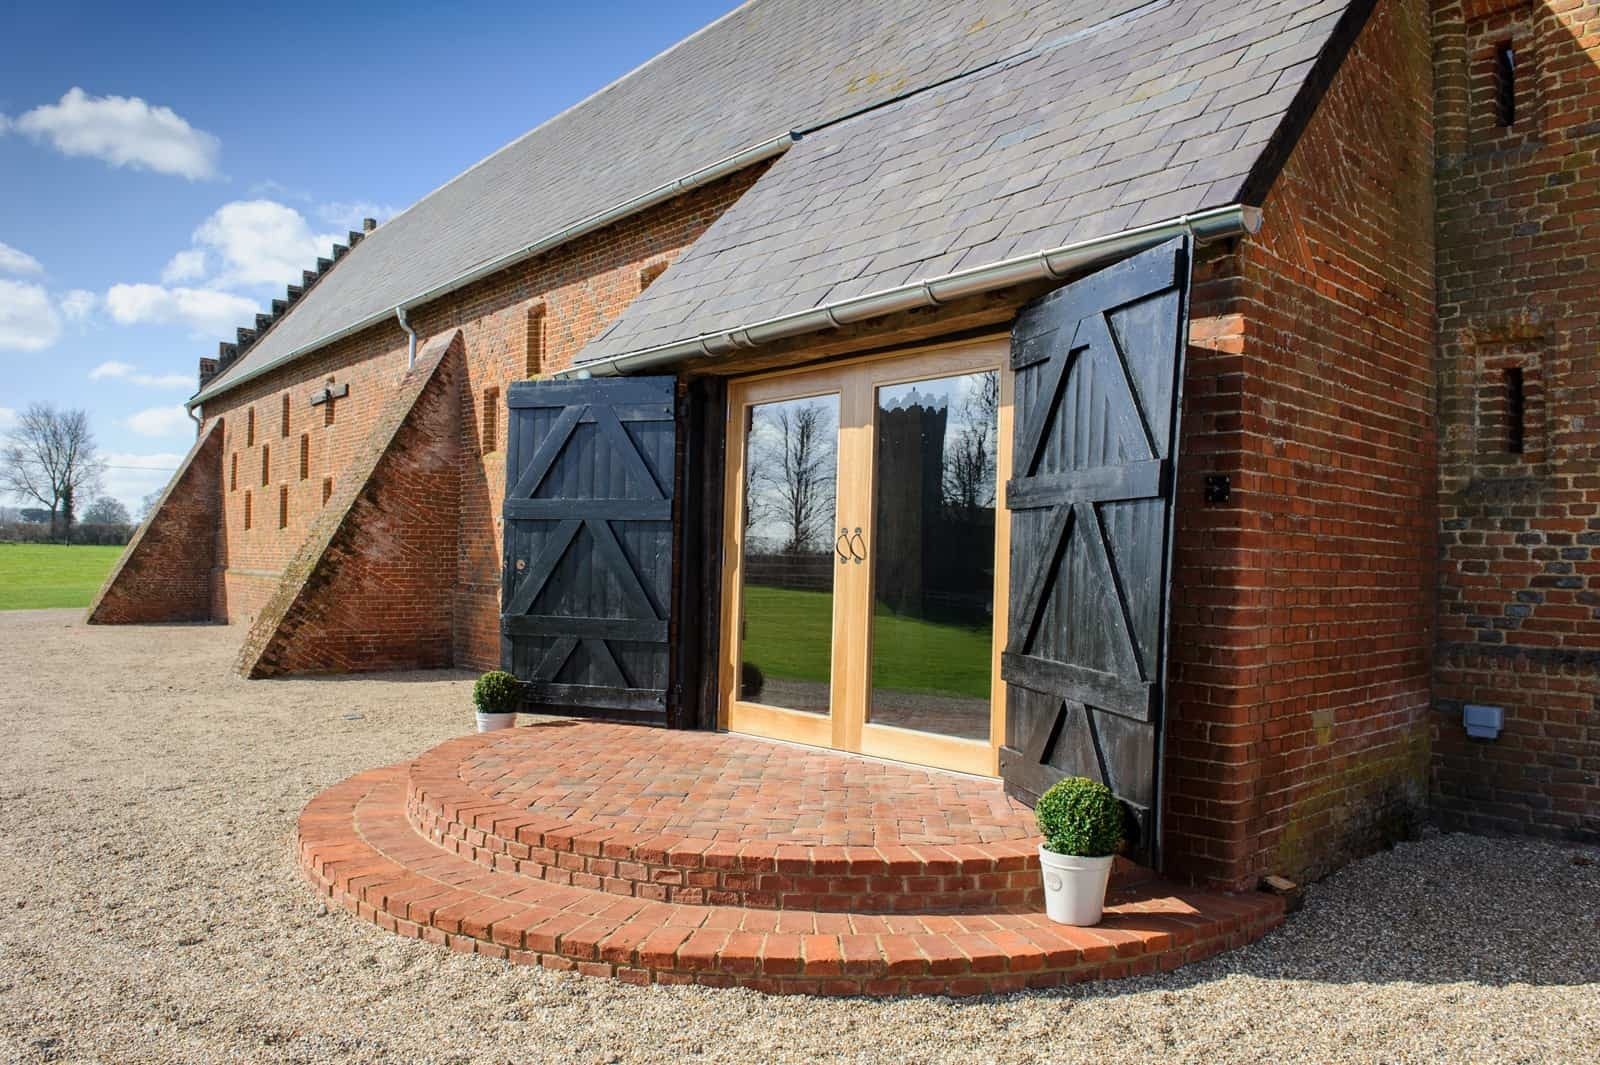 Pengelly gable at Copdock Hall barn